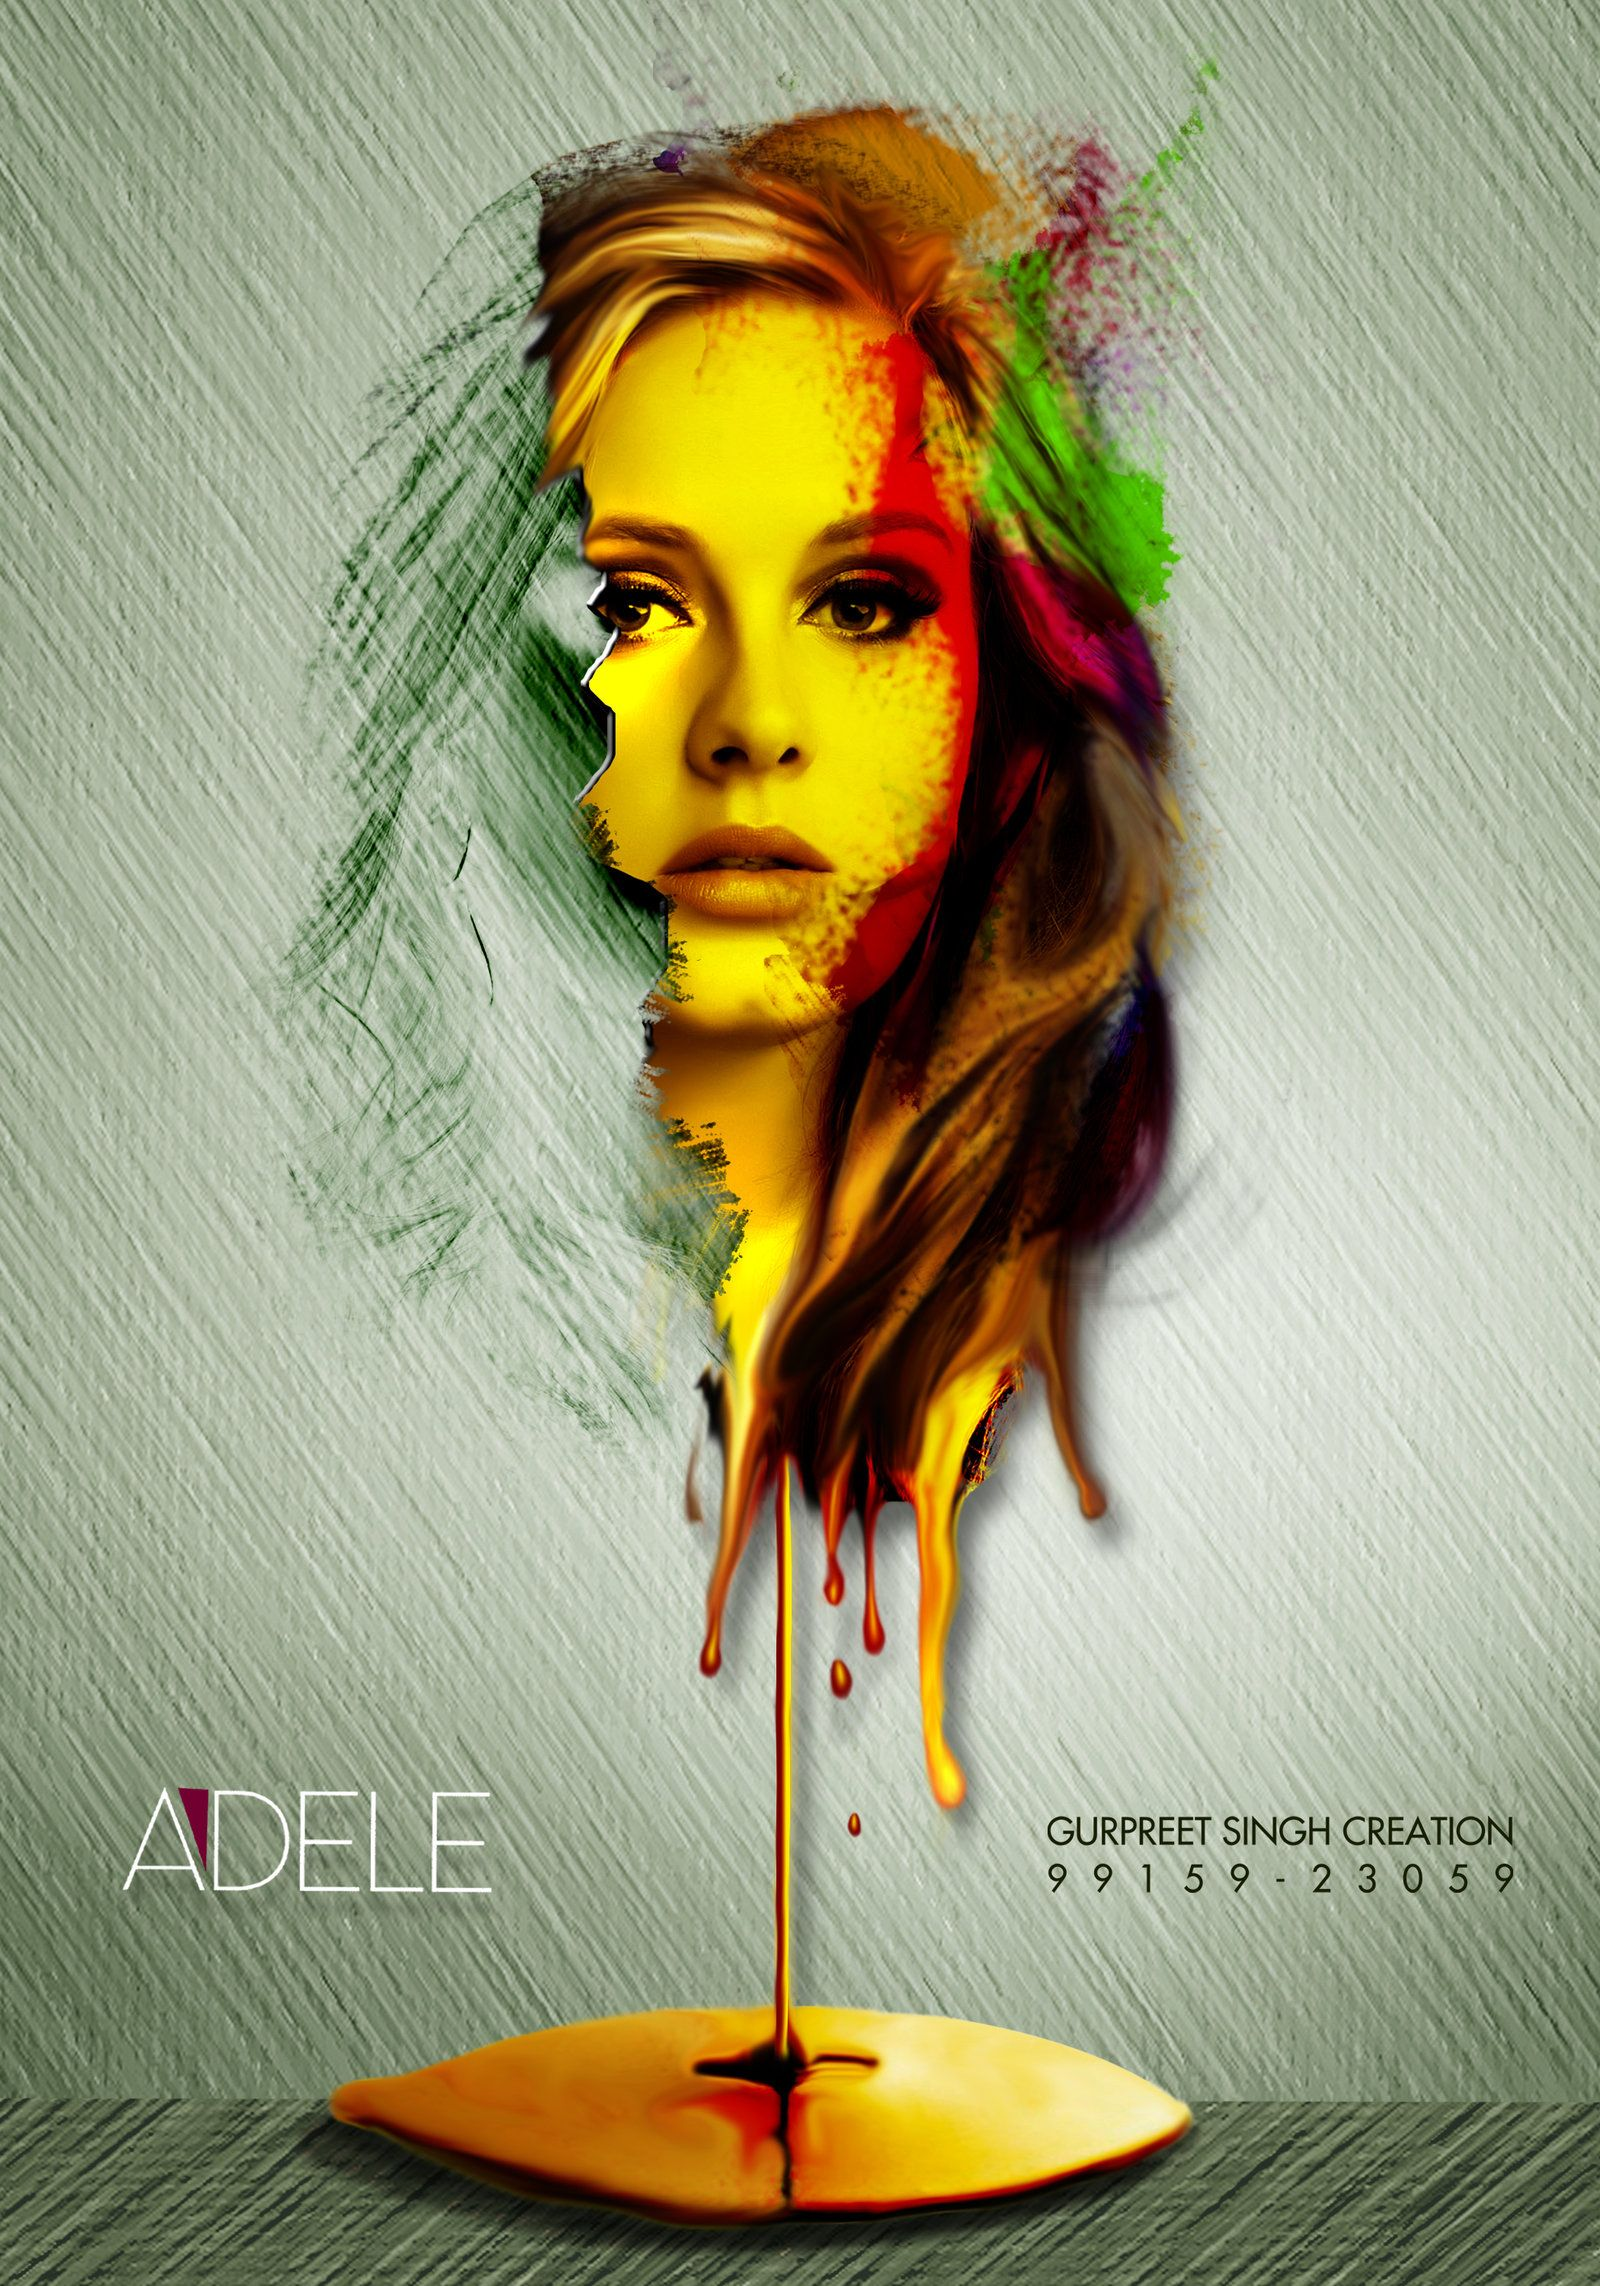 Adele laurie blue adkins adele photos adele concert